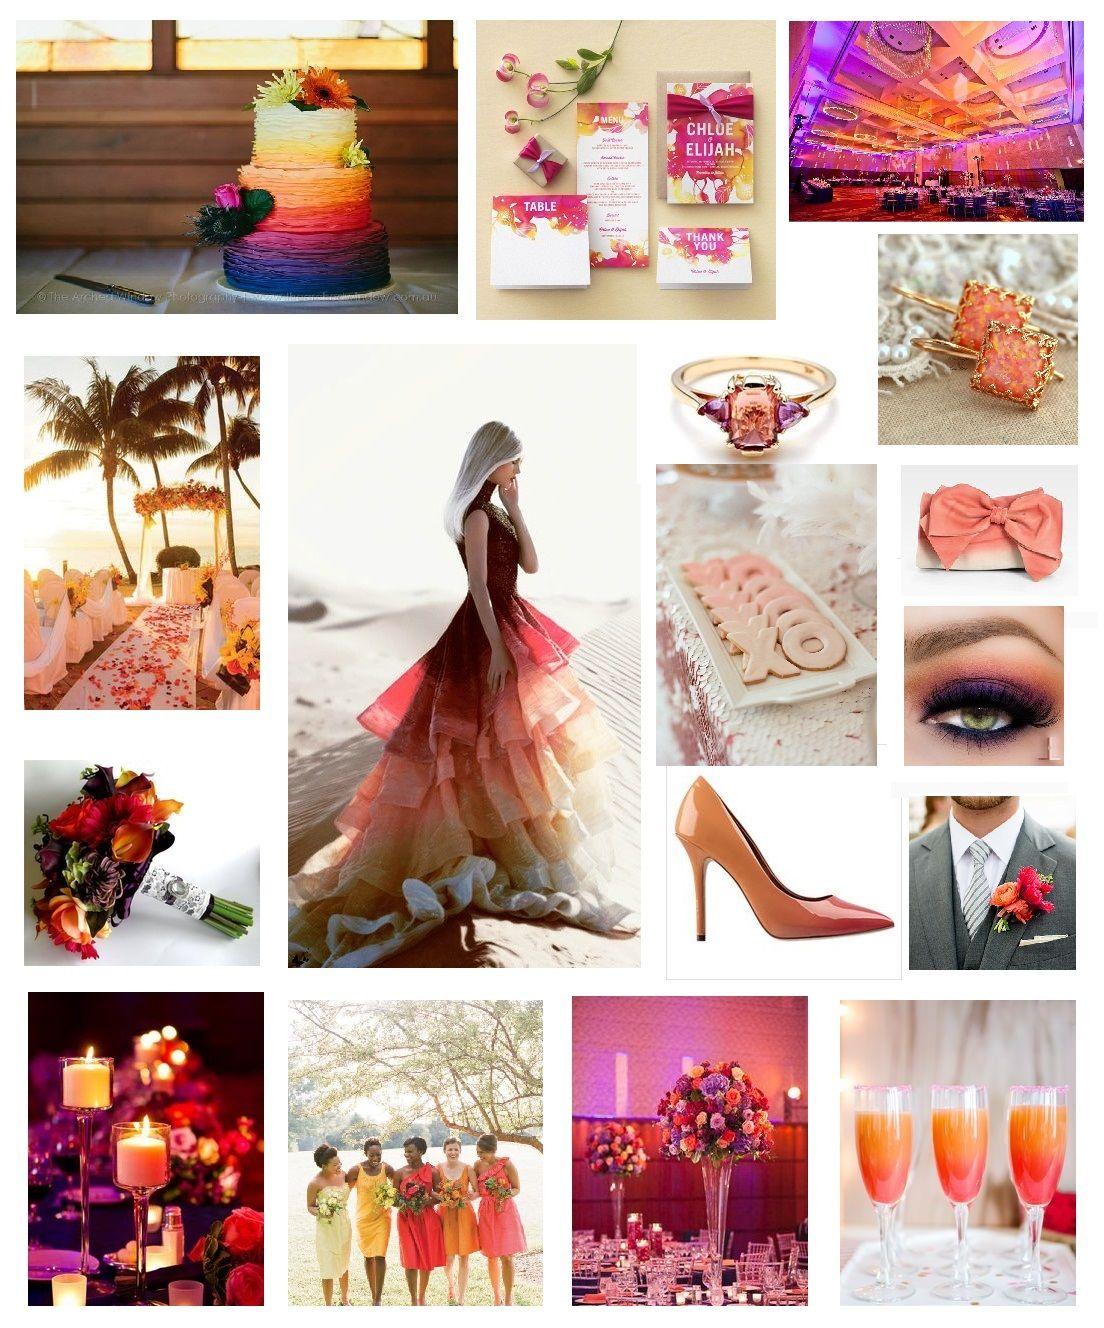 Sunset Beach Wedding Ideas: Sunset Themed Wedding Inspiration Board By Perfect Pair